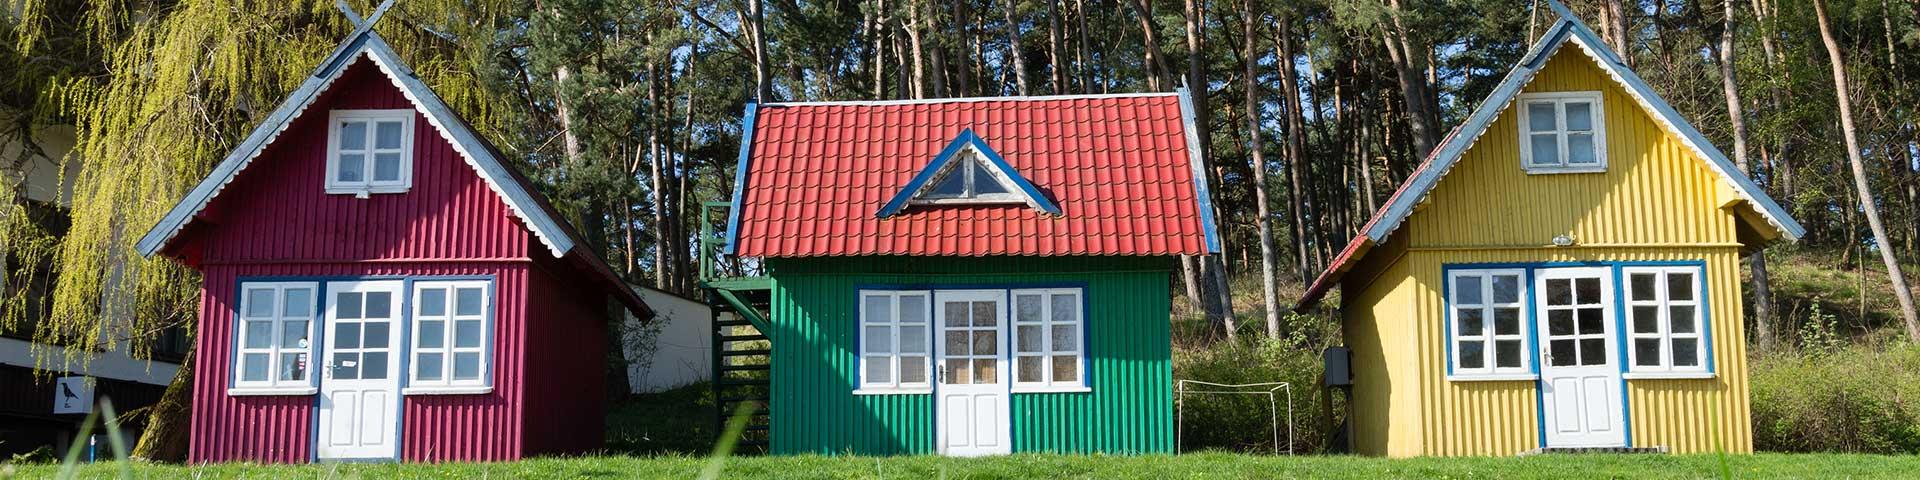 $30,000 Vancouver Micro Homes